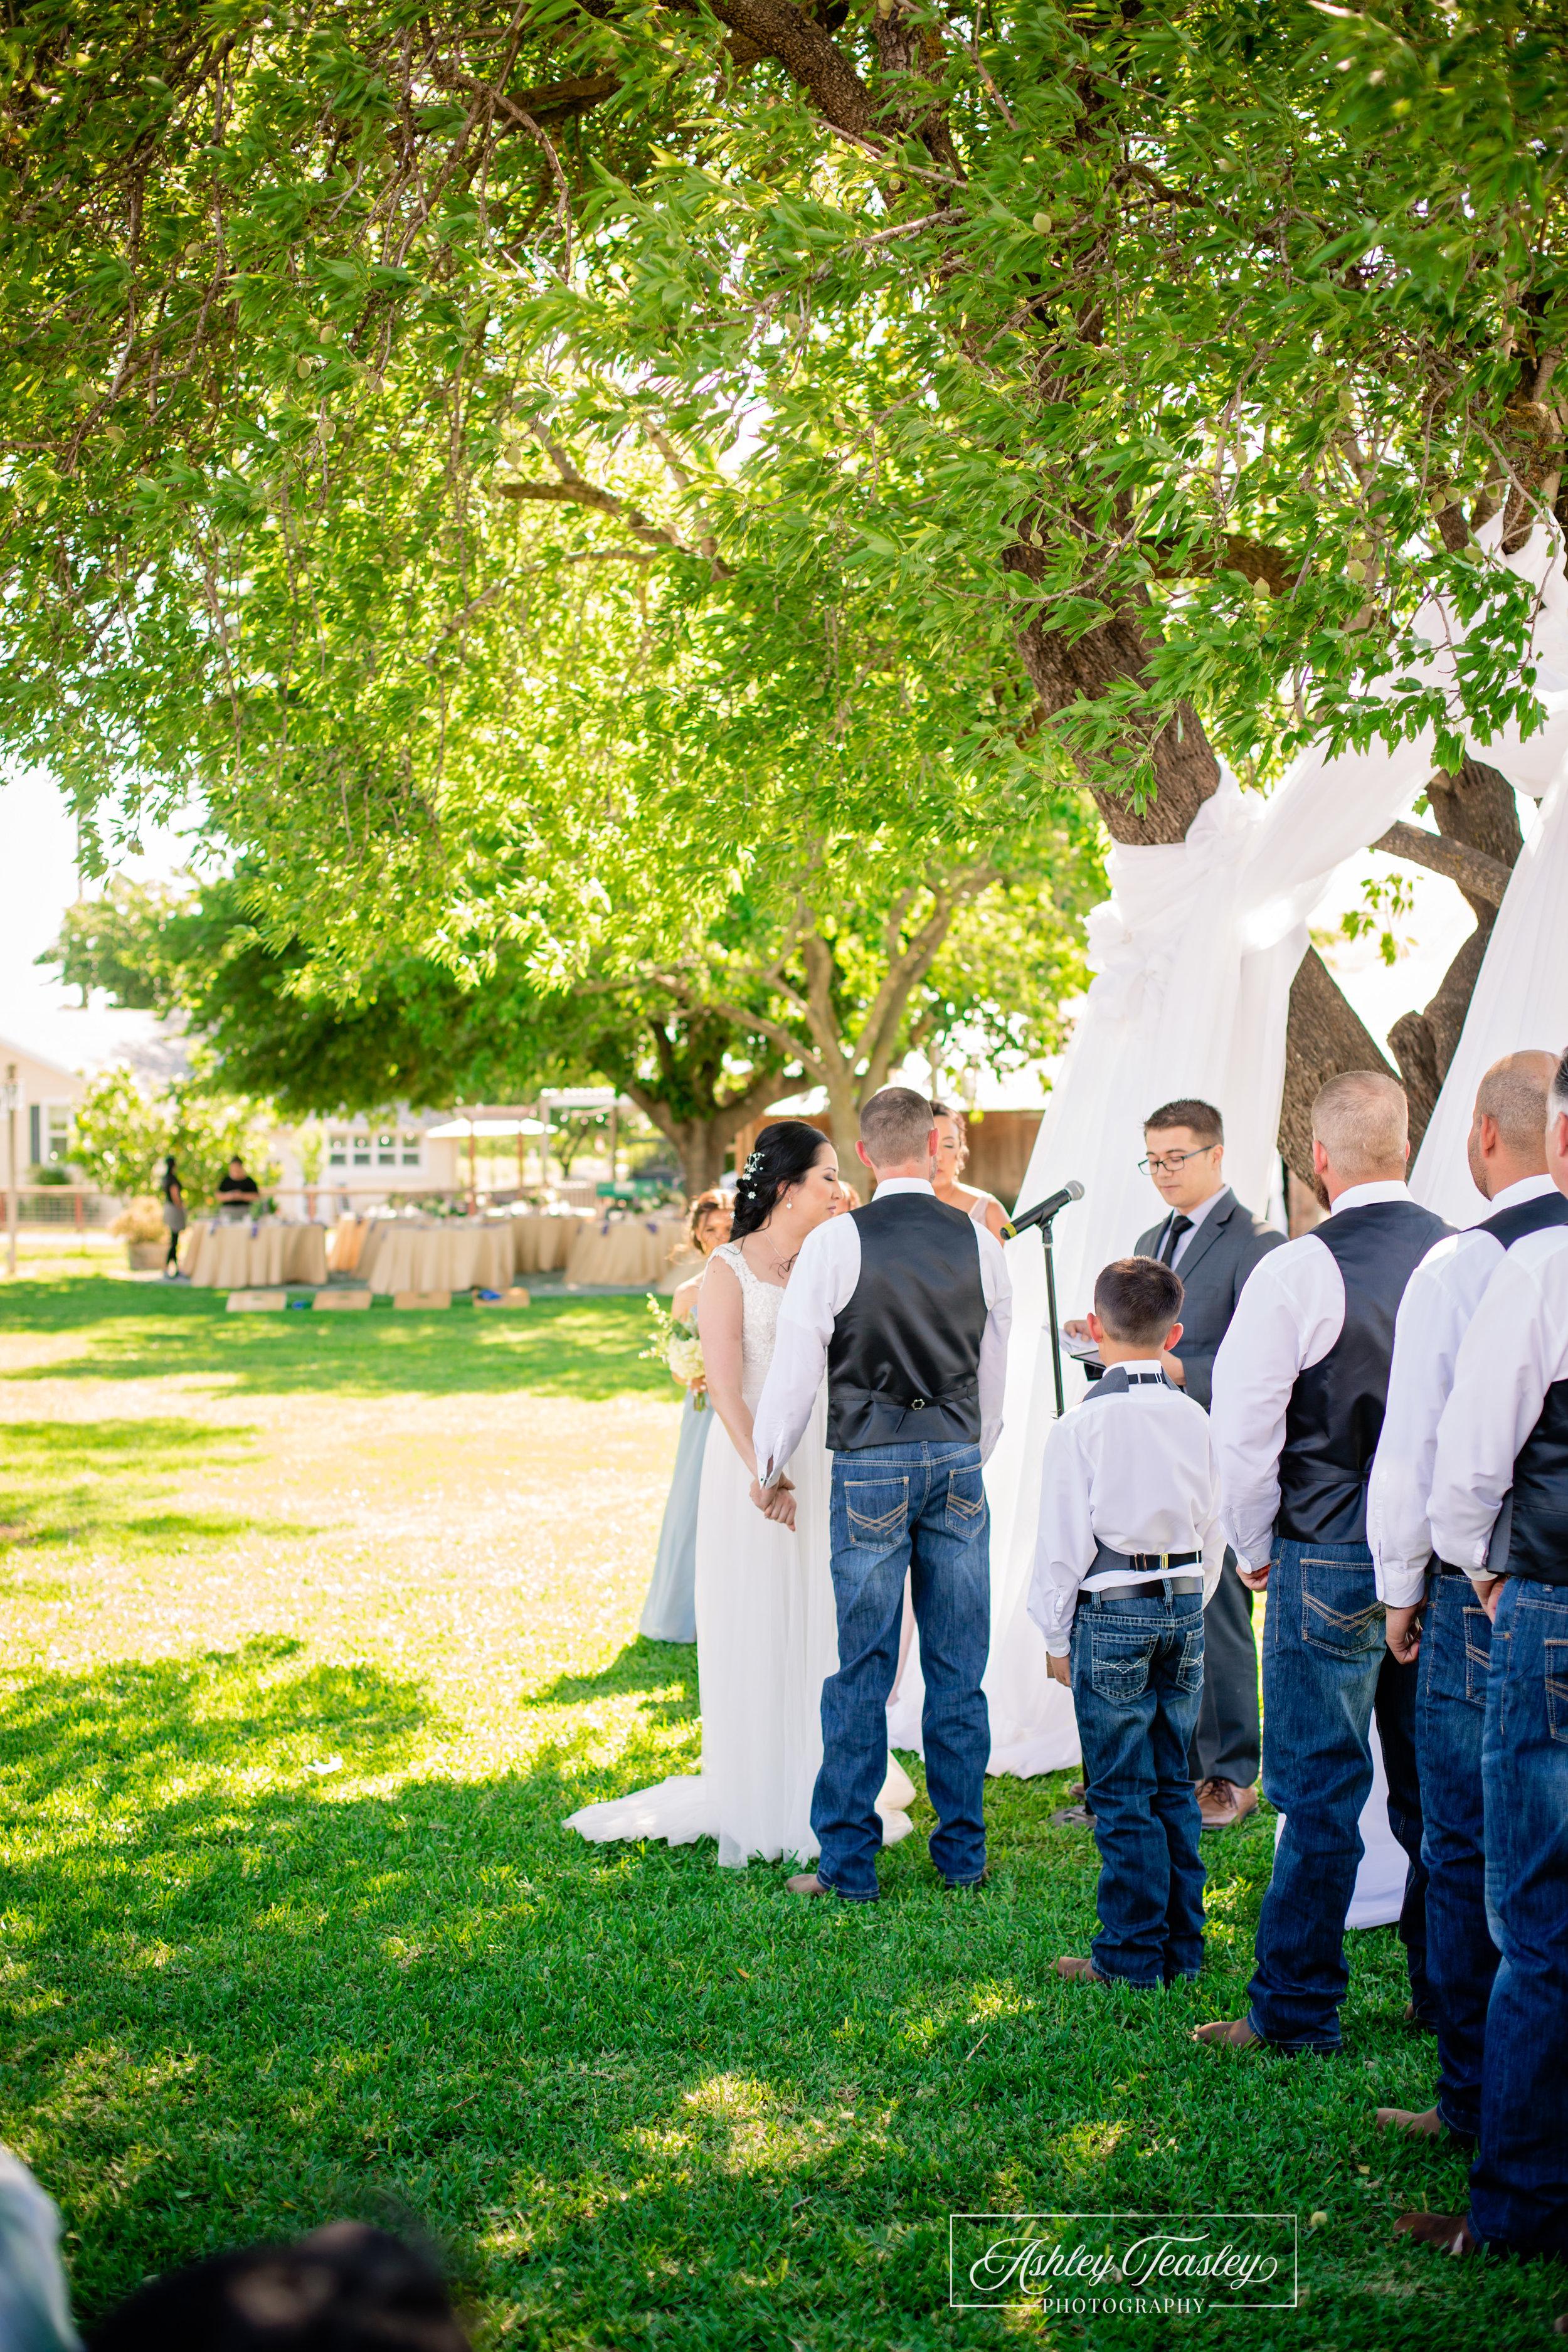 Jeanette & Rance - Butte Star Ranch - Sacramento Wedding Photographer - Ashley Teasley Photography (20 of 41).jpg